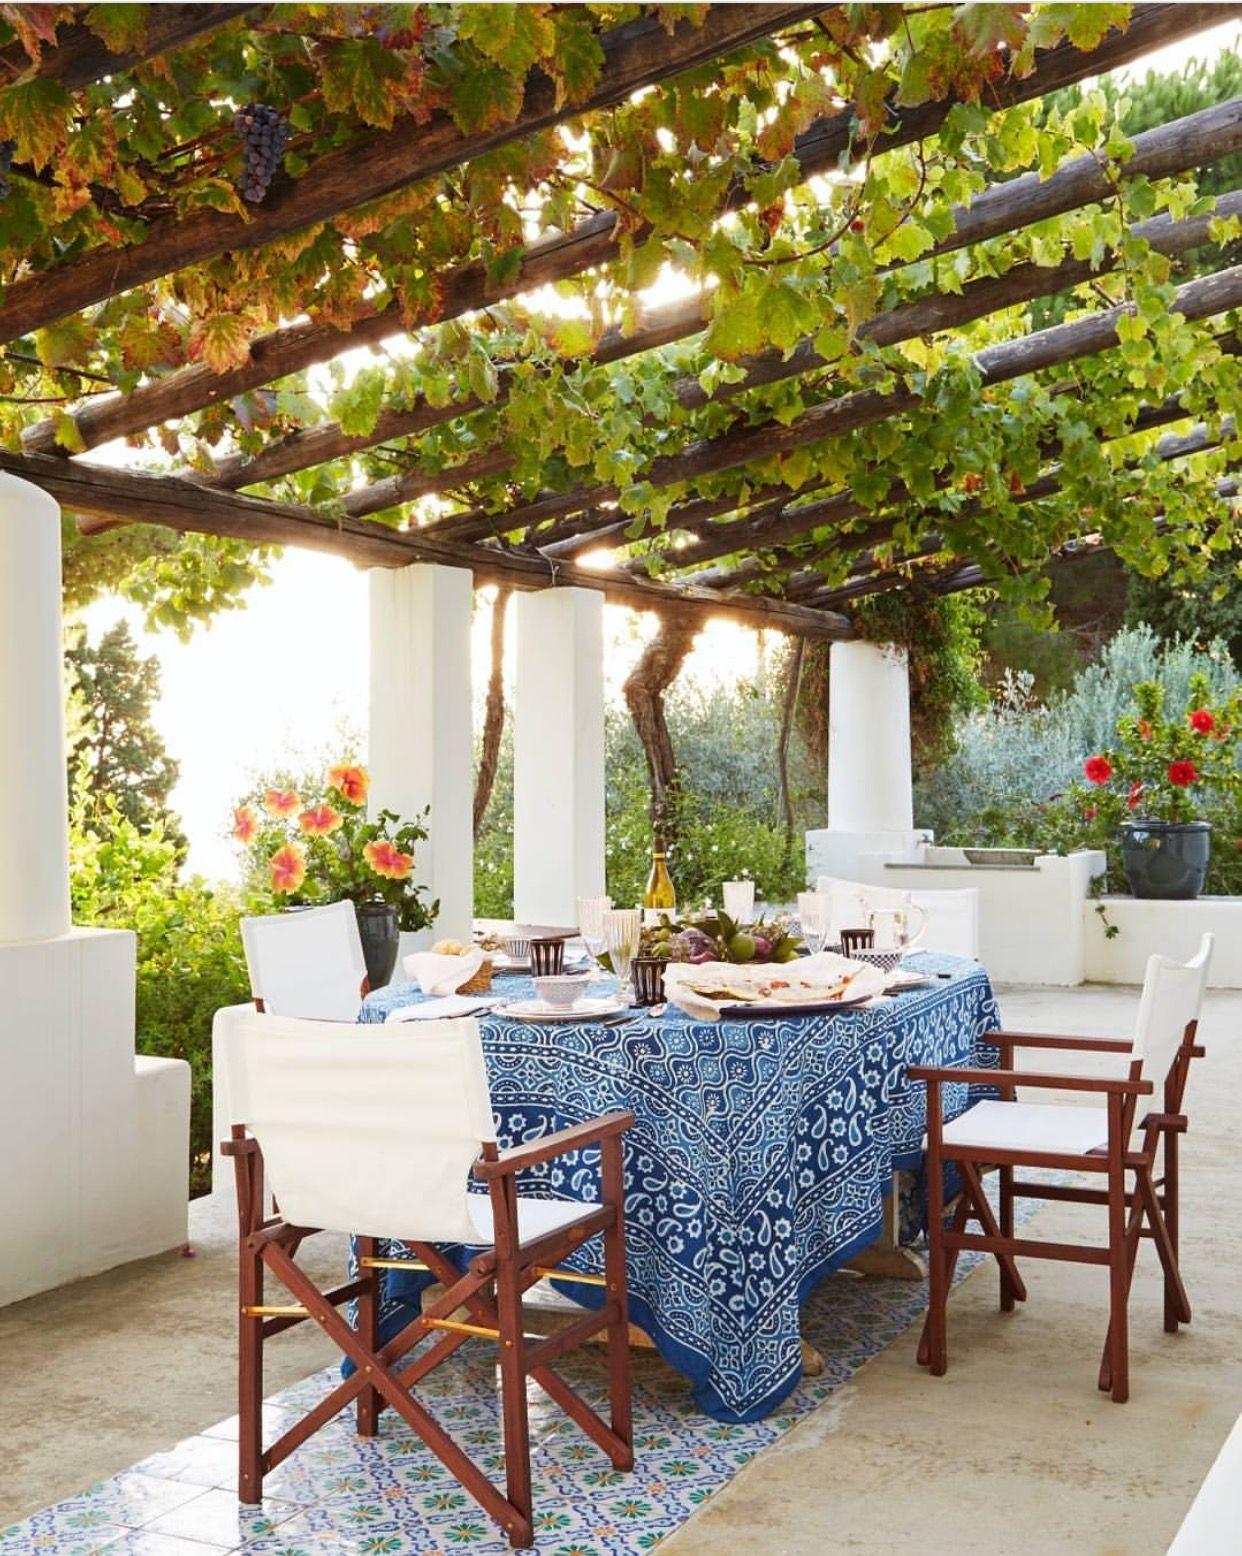 Al fresco dining under grape vines farm house ideas pinterest